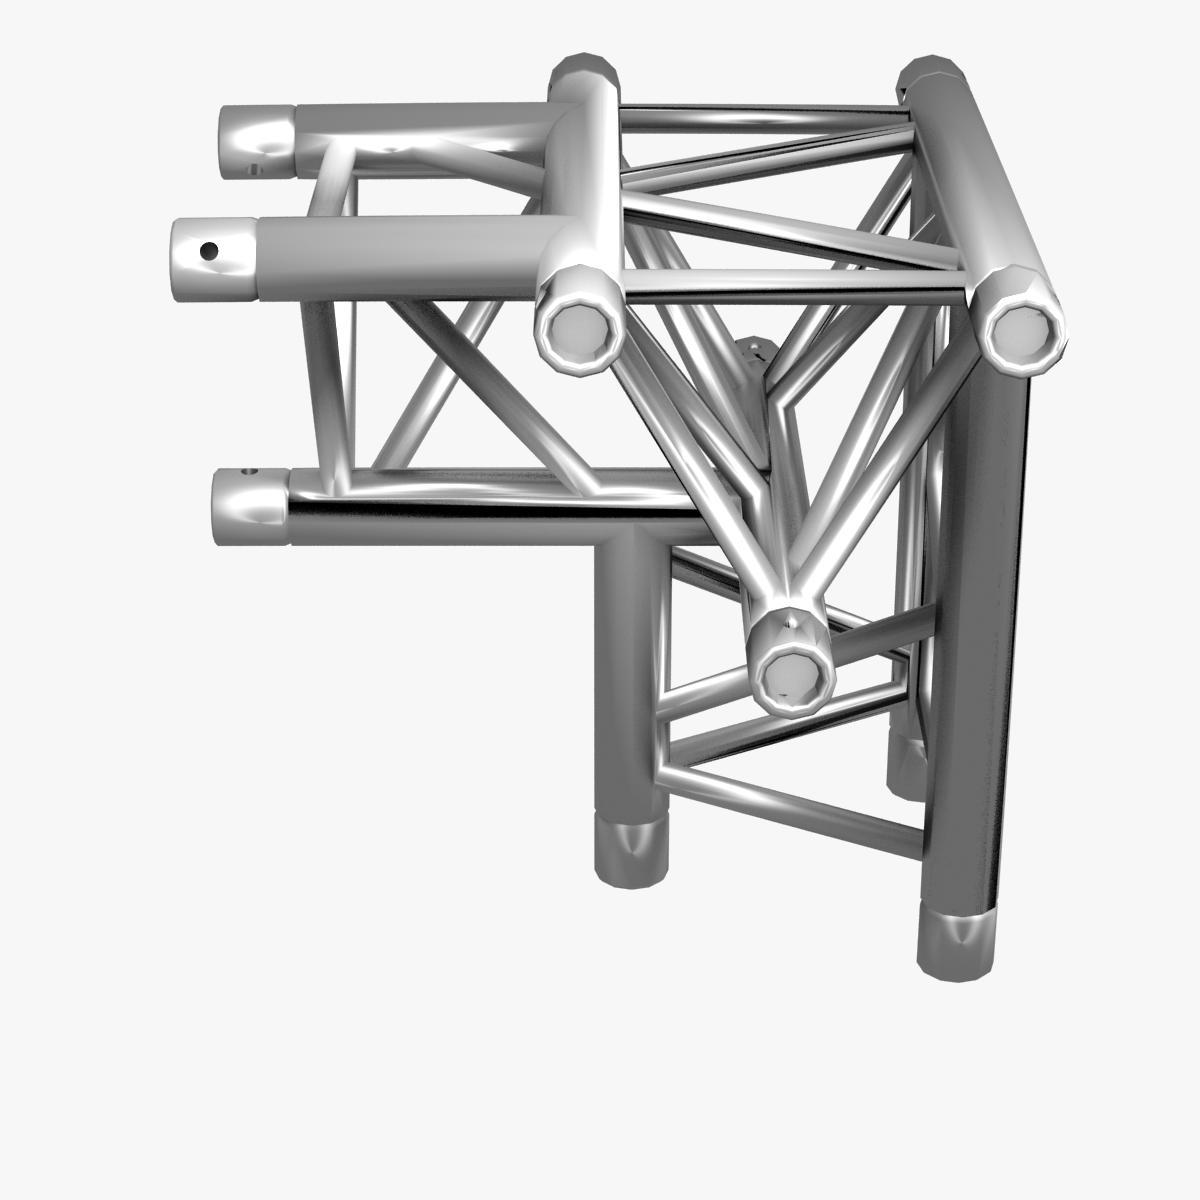 triangular trusses (collection 55 modular pieces) 3d model 3ds max dxf fbx c4d dae texture obj 216223